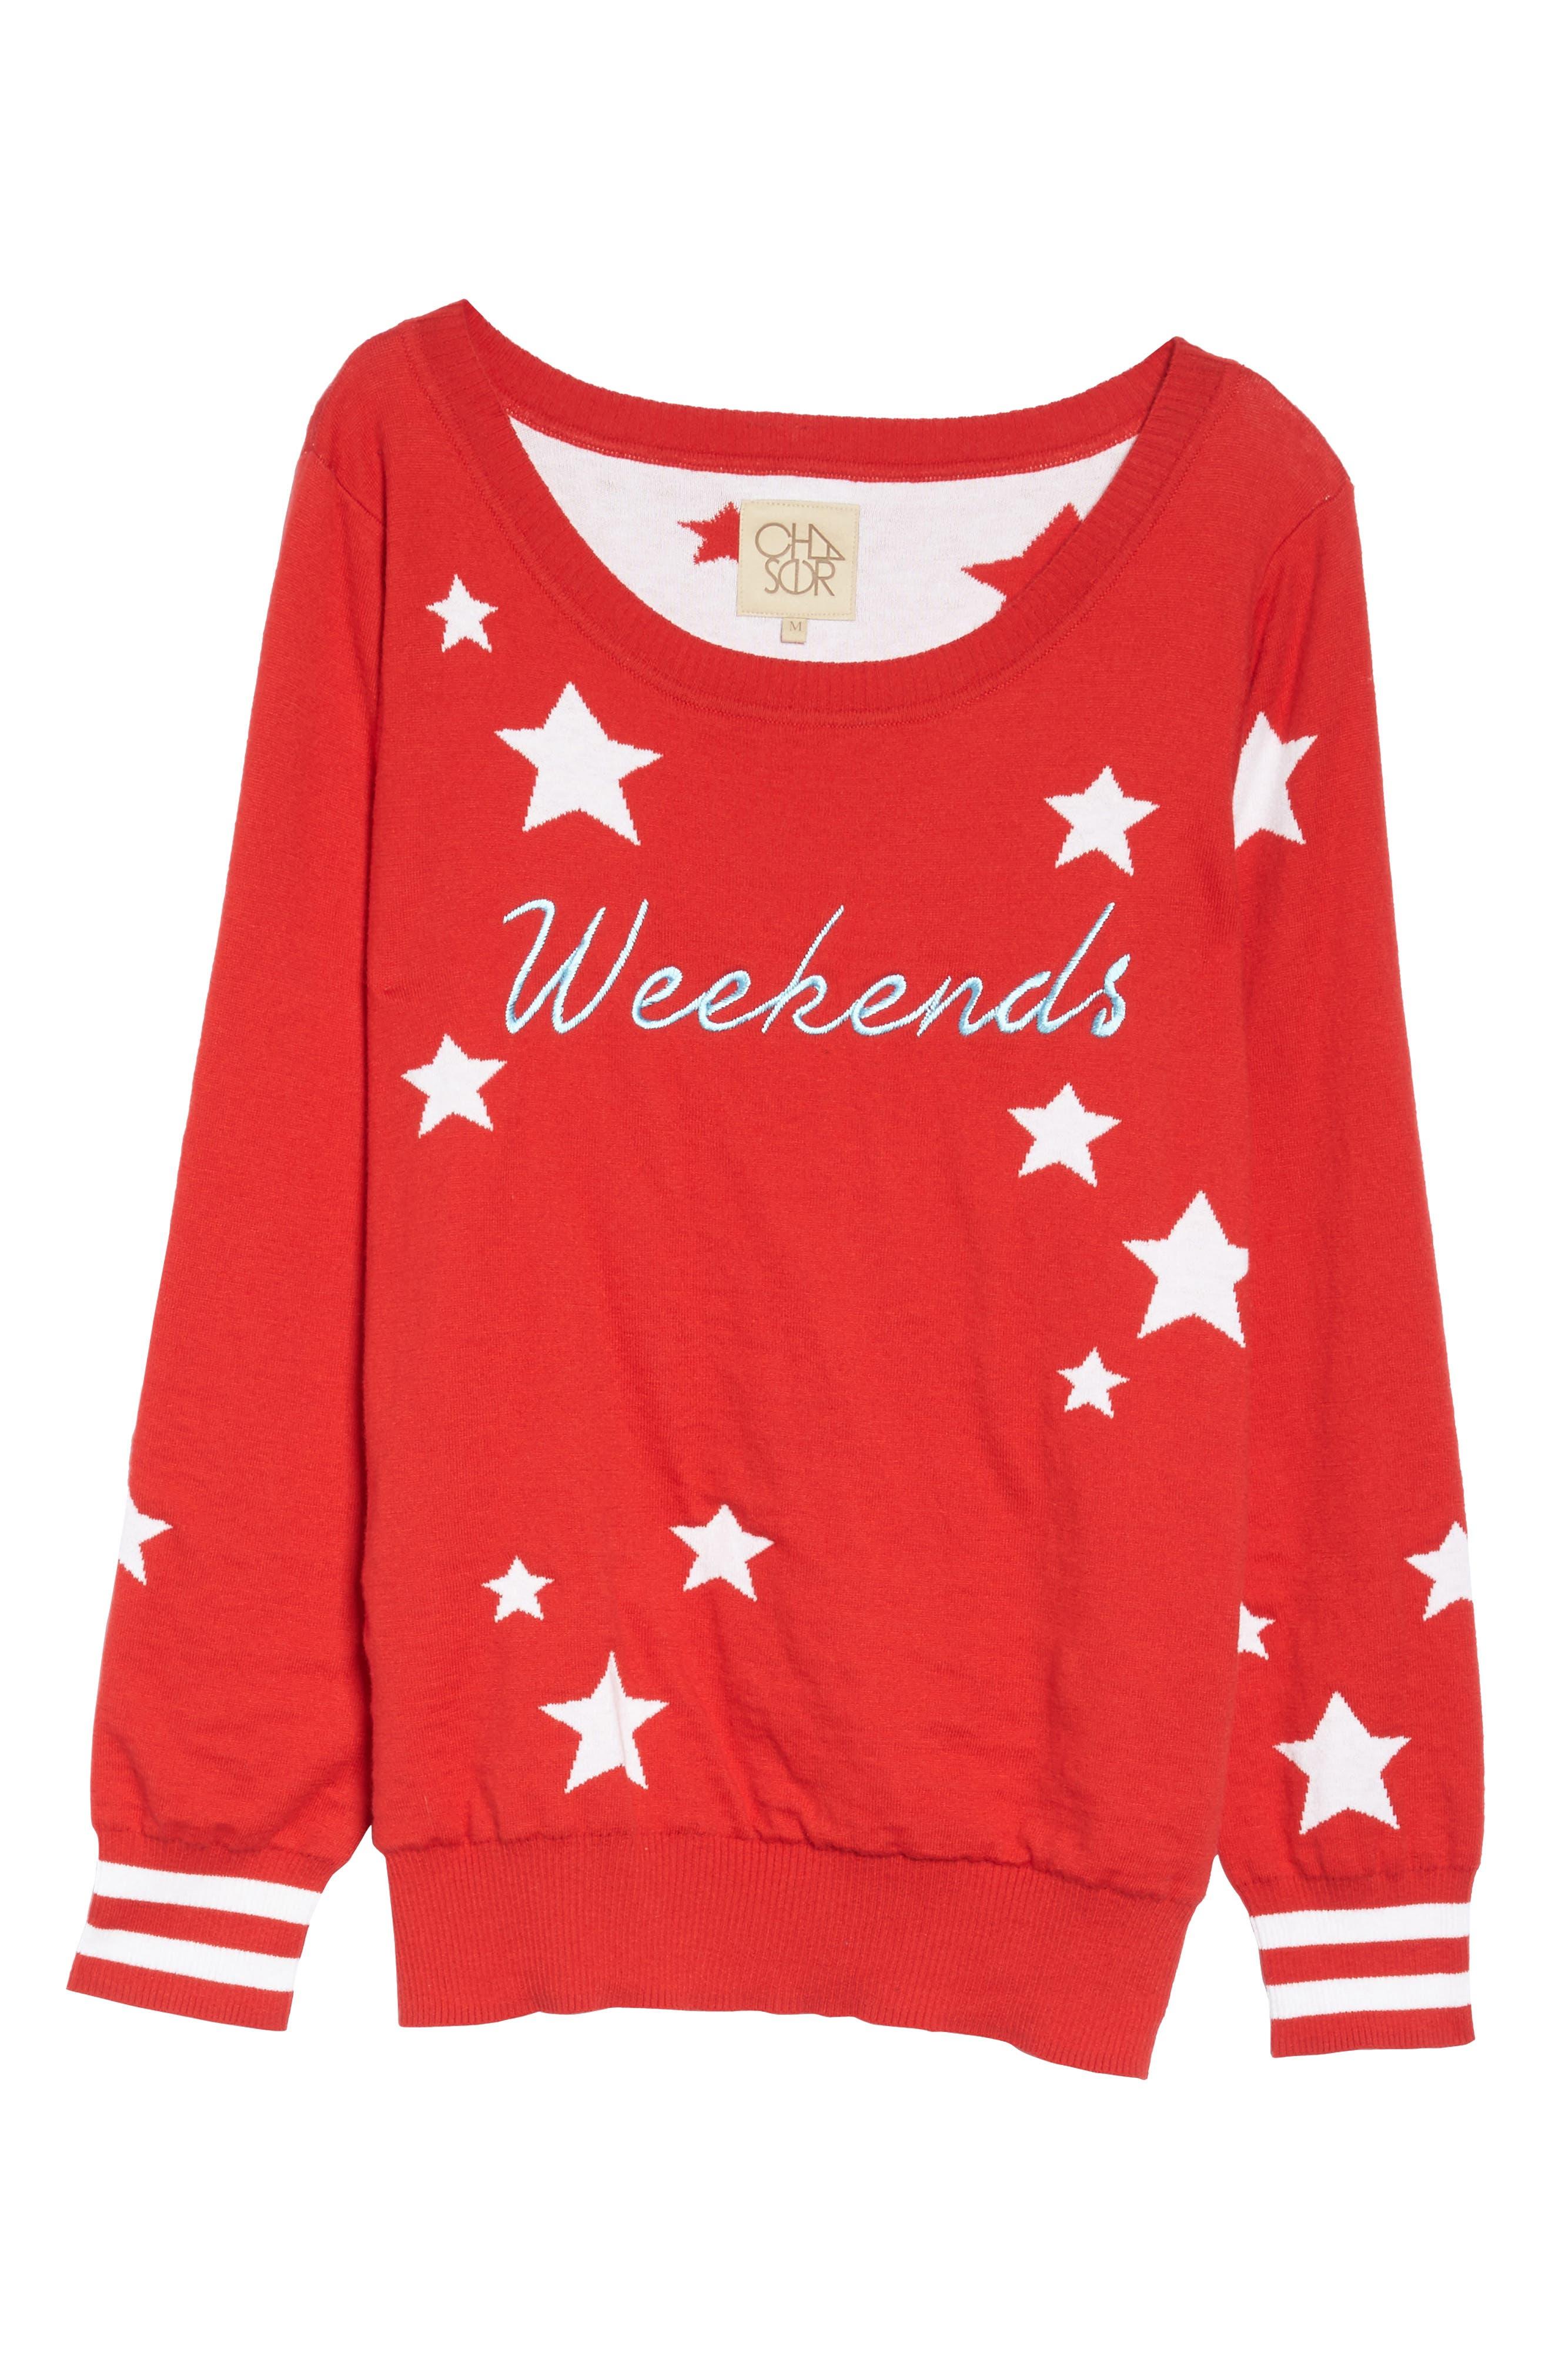 Weekends Intarsia Sweater,                             Alternate thumbnail 4, color,                             Cardinal